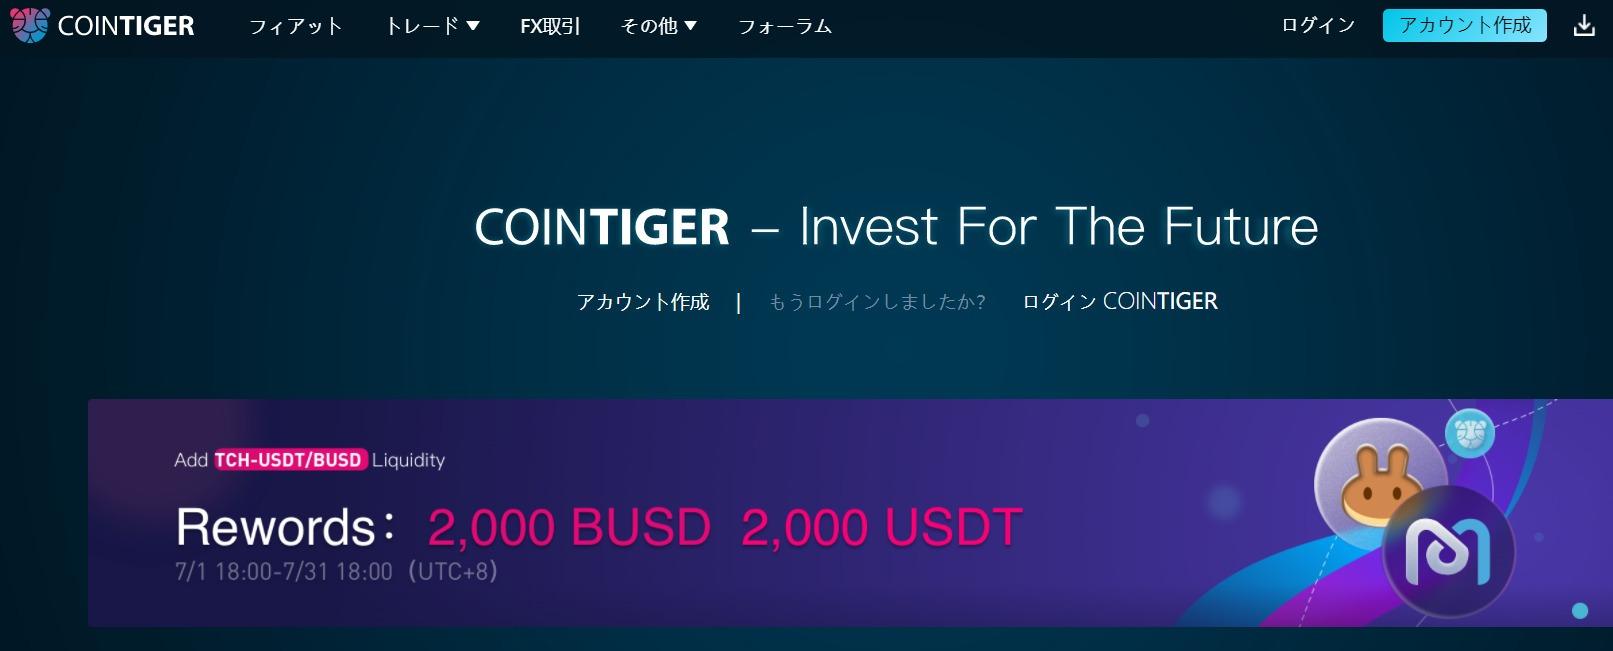 CoinTiger 日本人_公式サイト